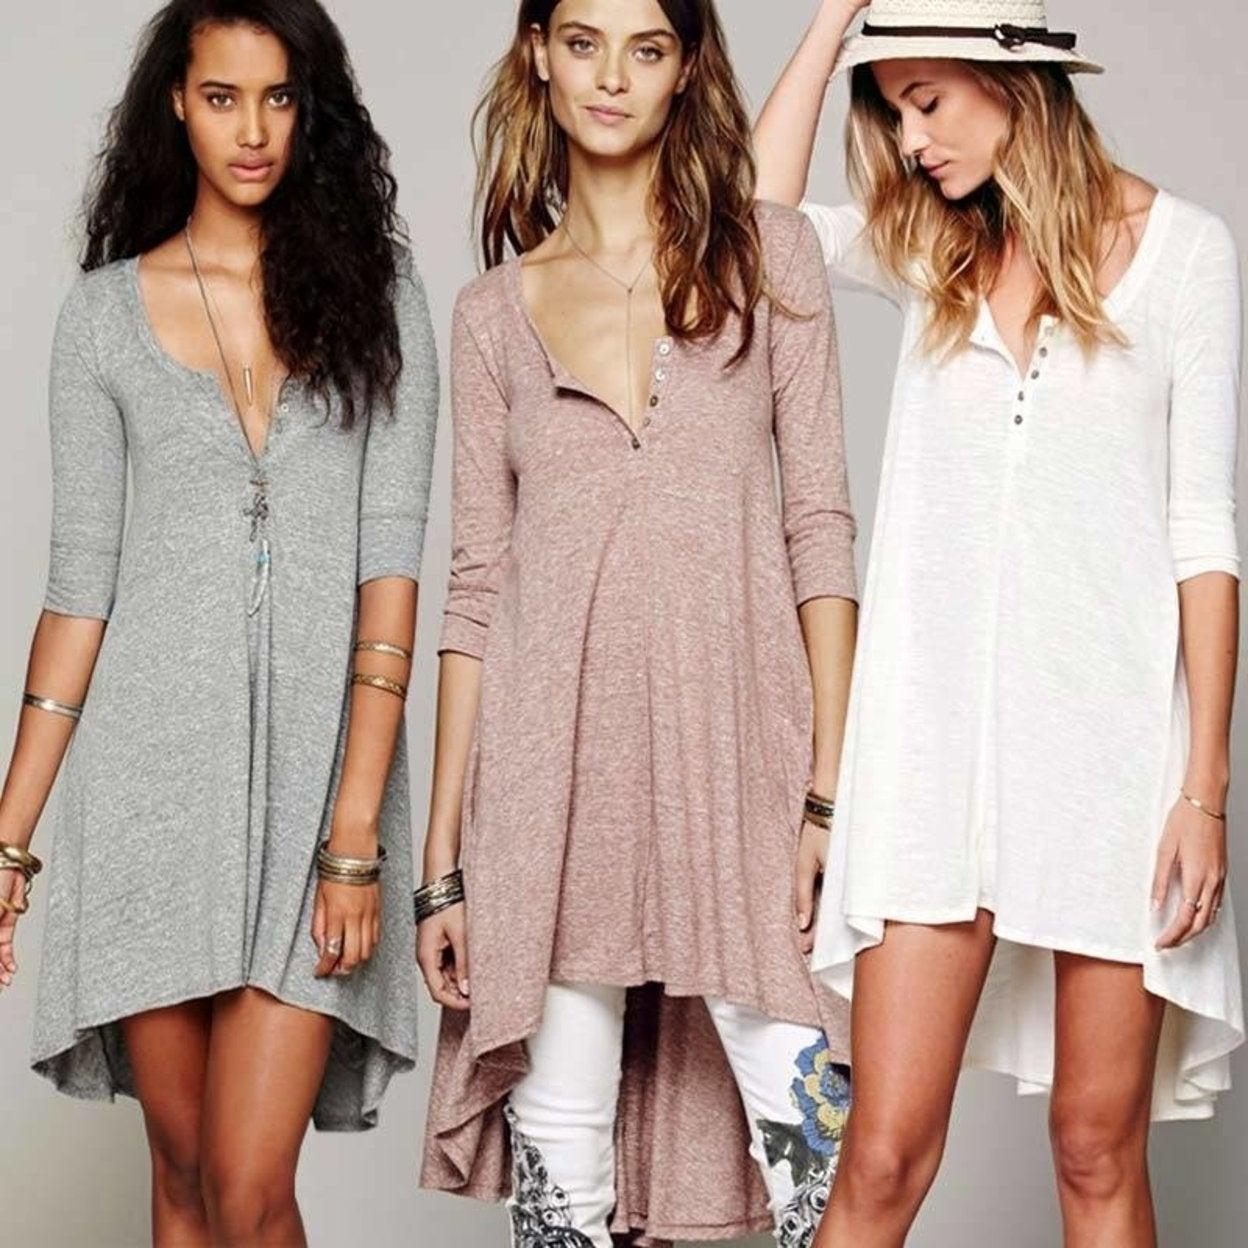 T Shirt Dress Women Long Shirt Dress Cotton Loose Sleeve V Neck Boho Style Hippie Chic Summer Autumn 2017 Women Robes Clothing Overstock 27108132